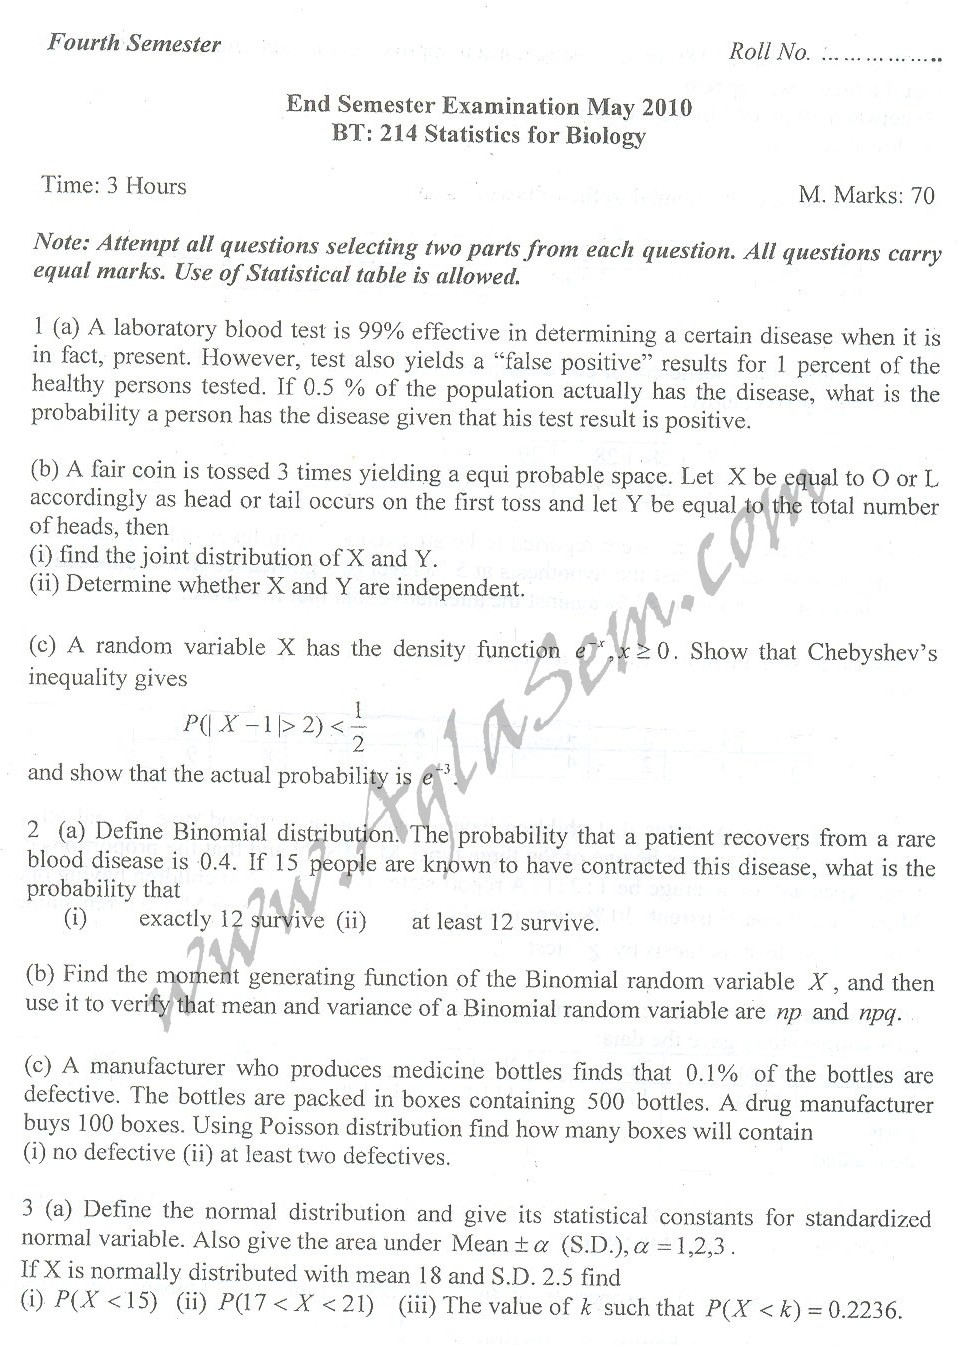 DTU Question Papers 2010 – 4 Semester - End Sem - BT-214